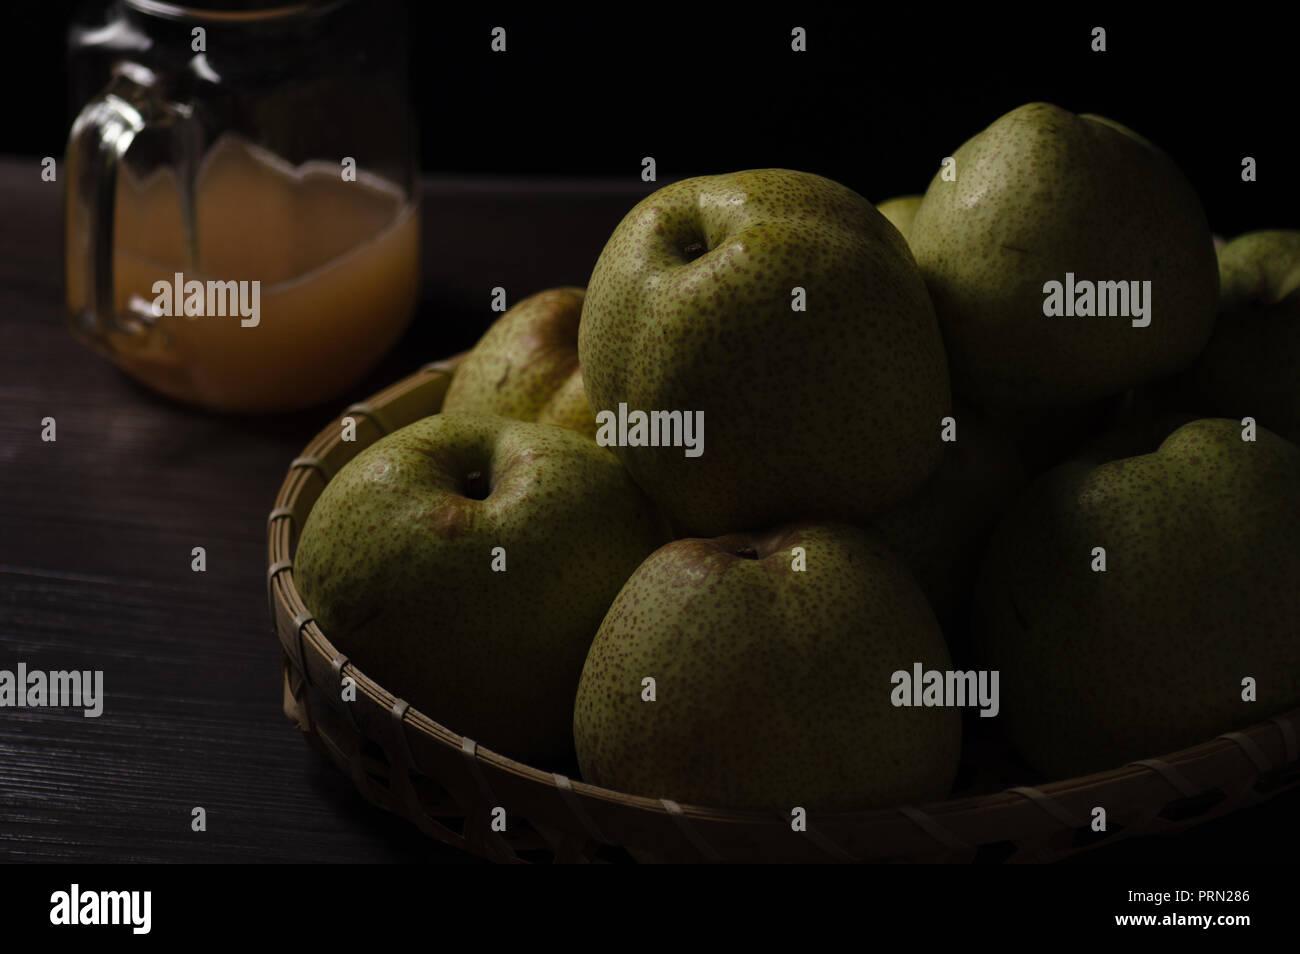 Food dark mood pear Stock Photo